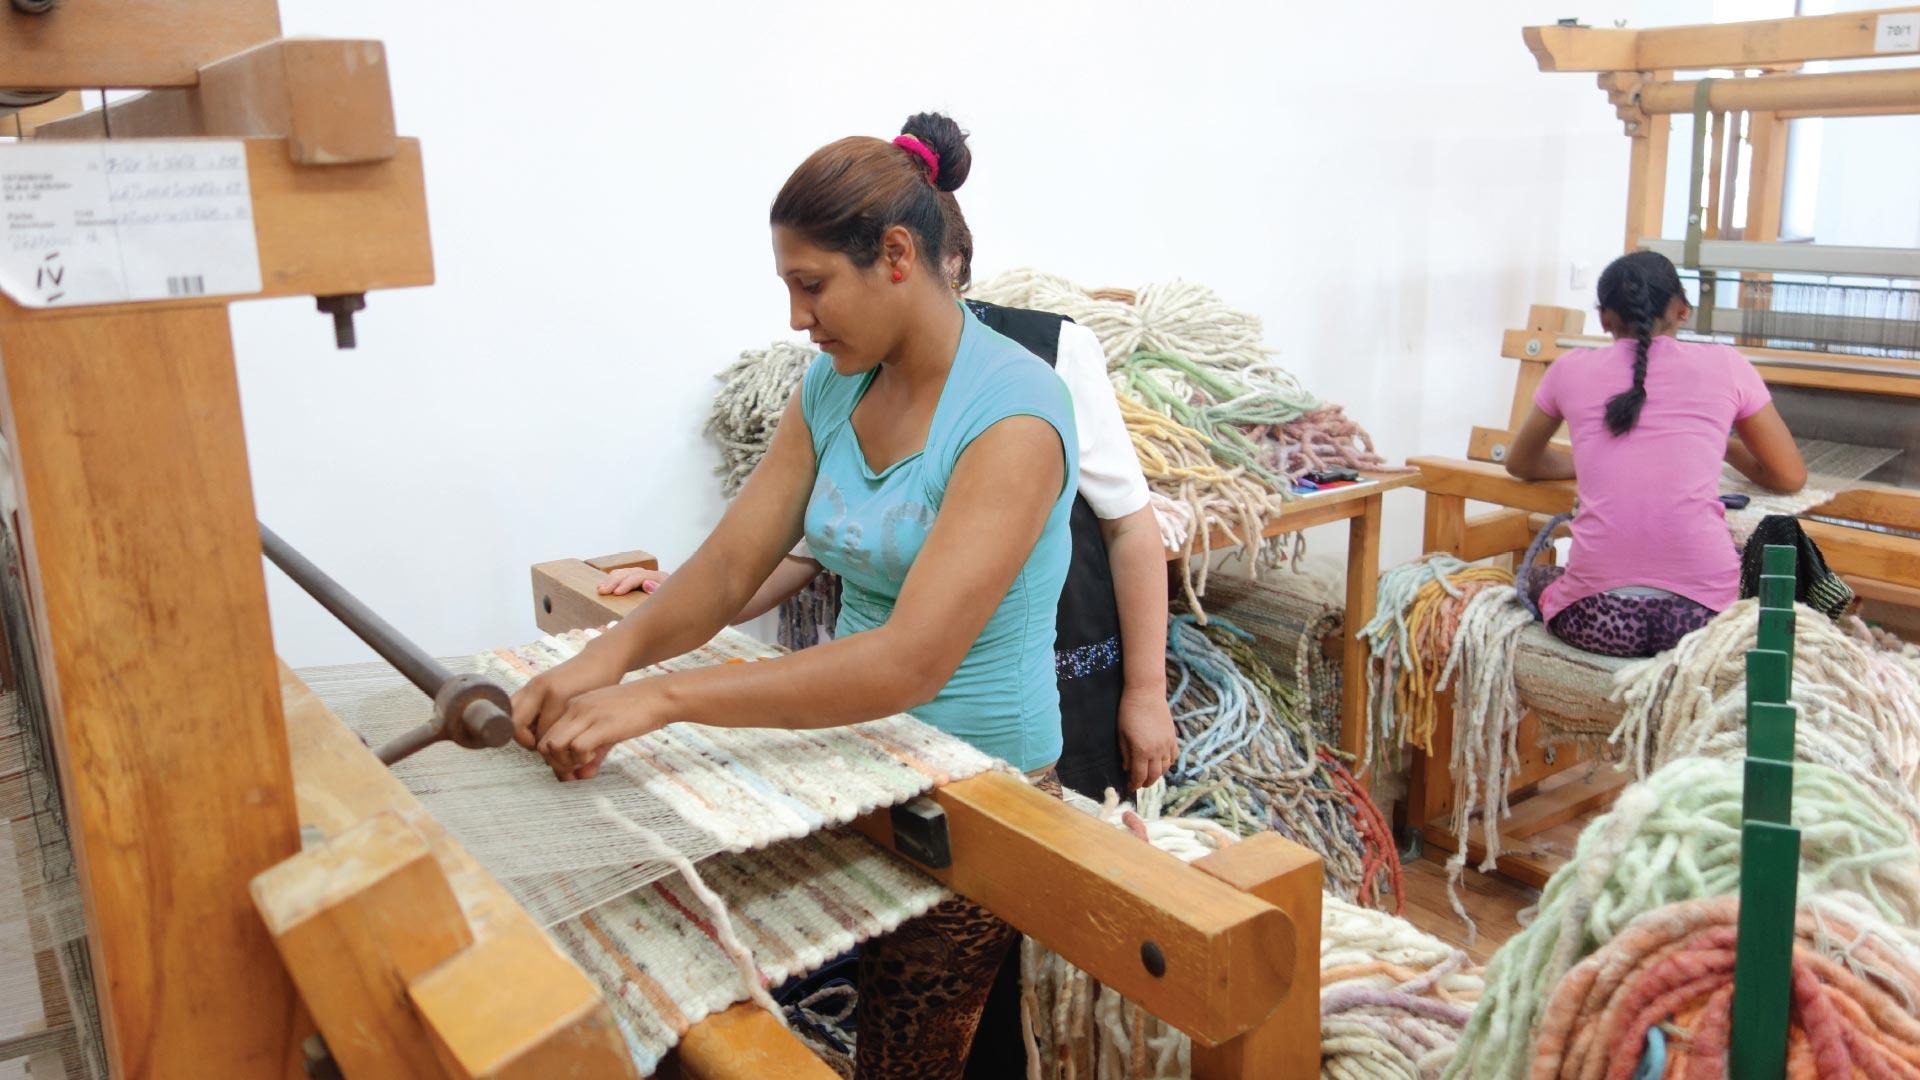 Brinker Carpets karpetten maken is hand arbeid